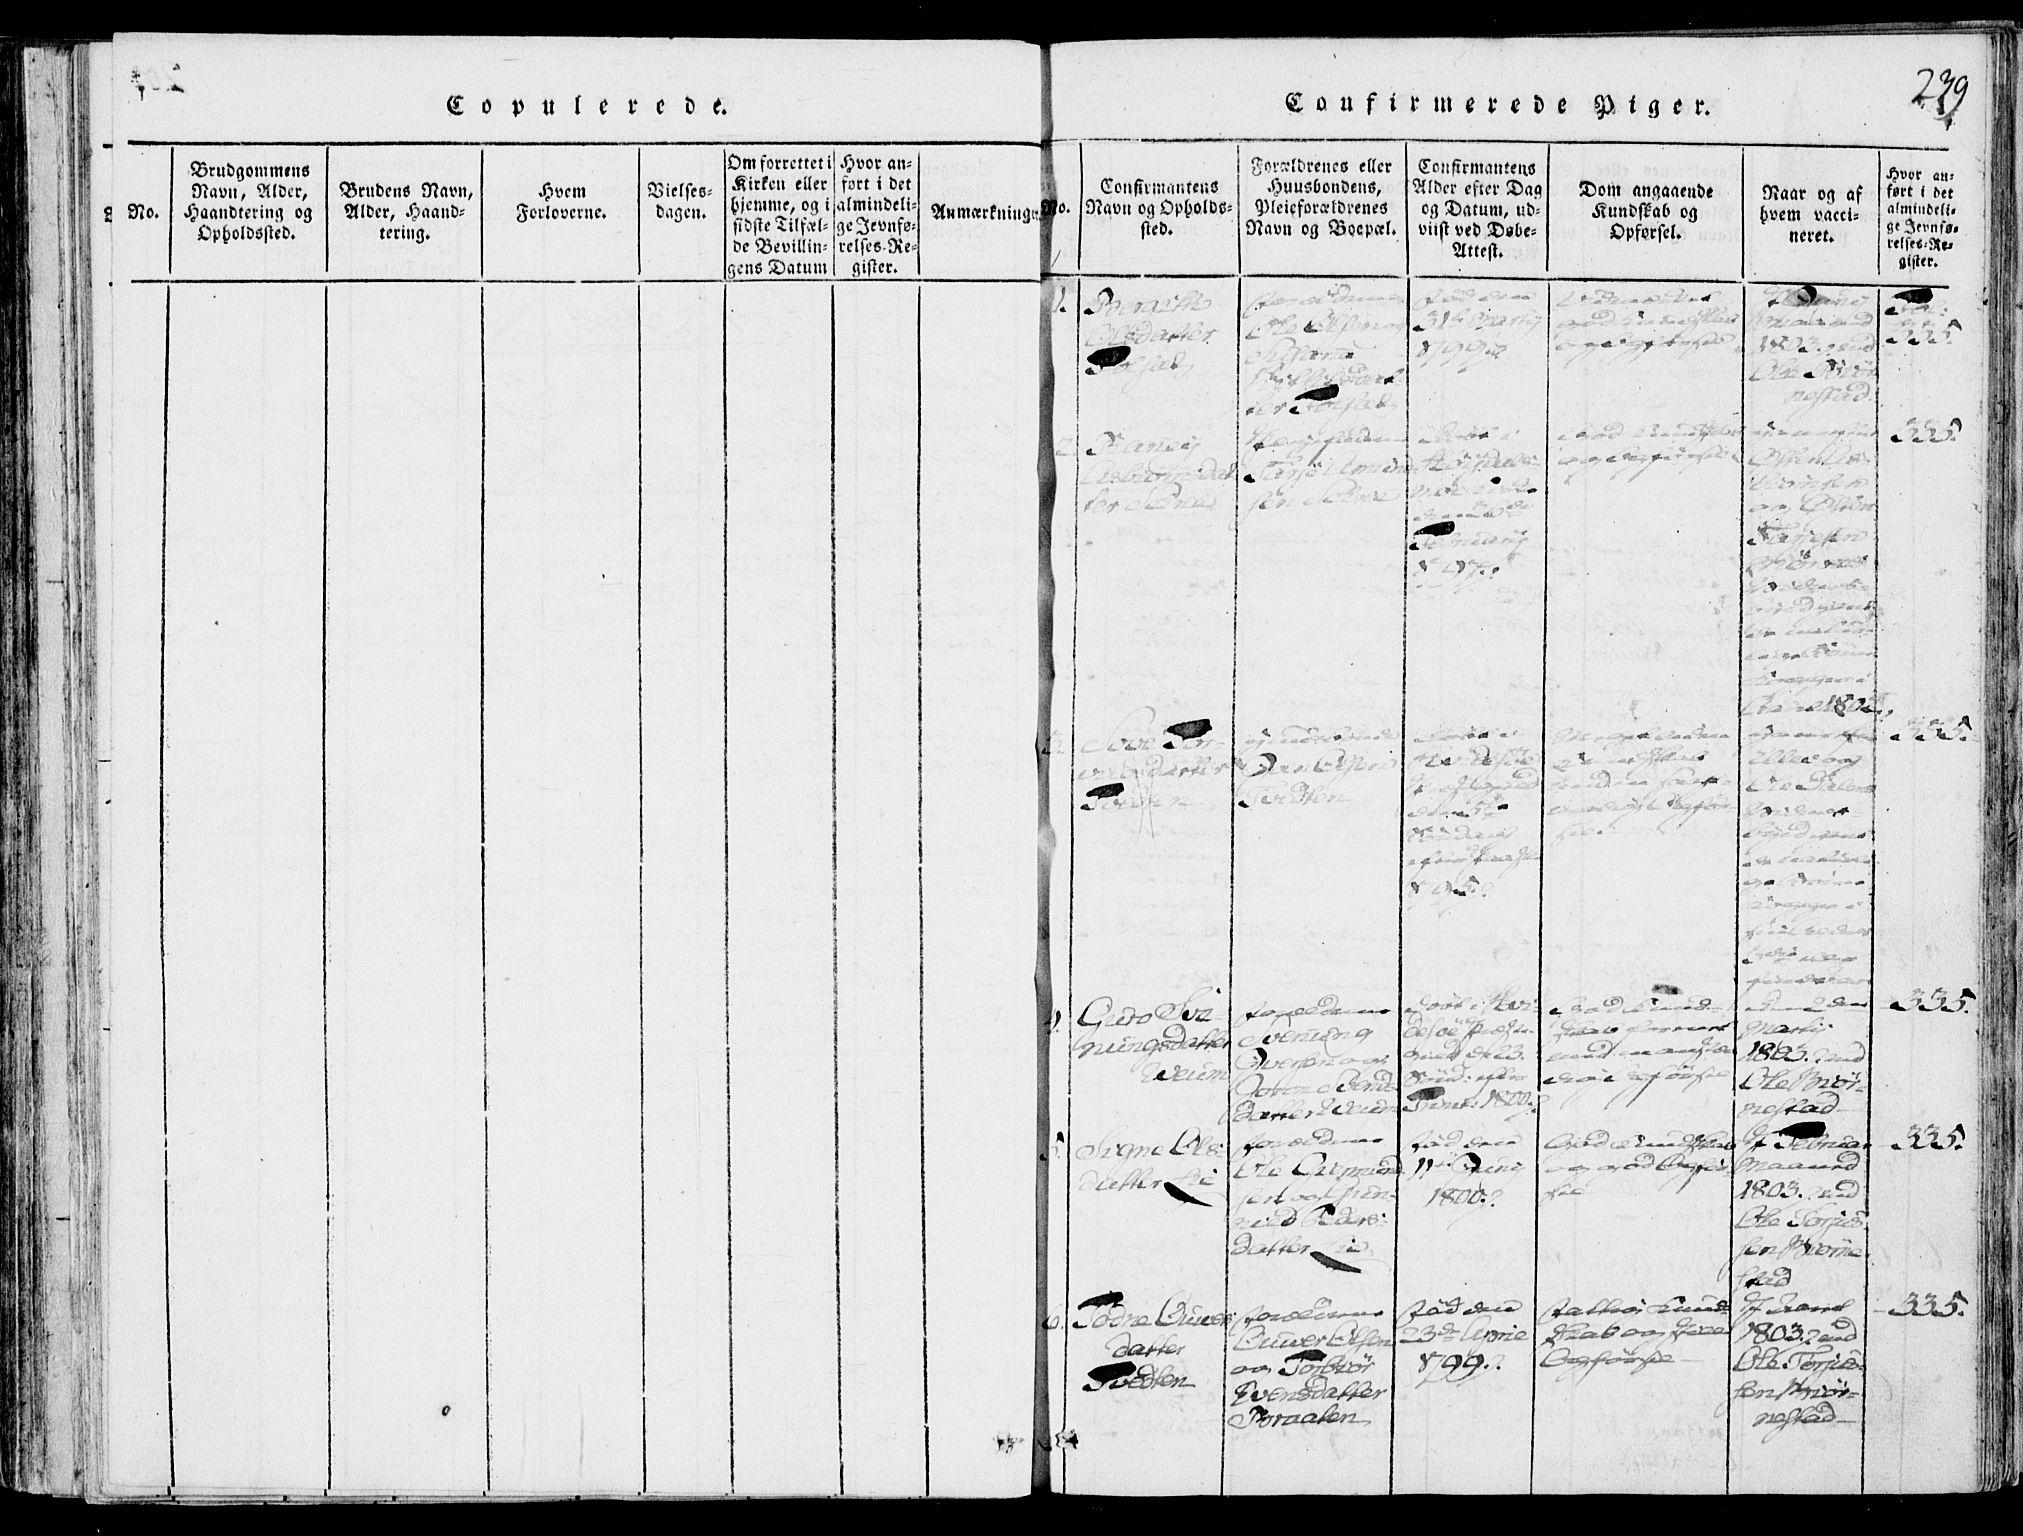 SAKO, Fyresdal kirkebøker, F/Fb/L0001: Ministerialbok nr. II 1, 1815-1854, s. 239